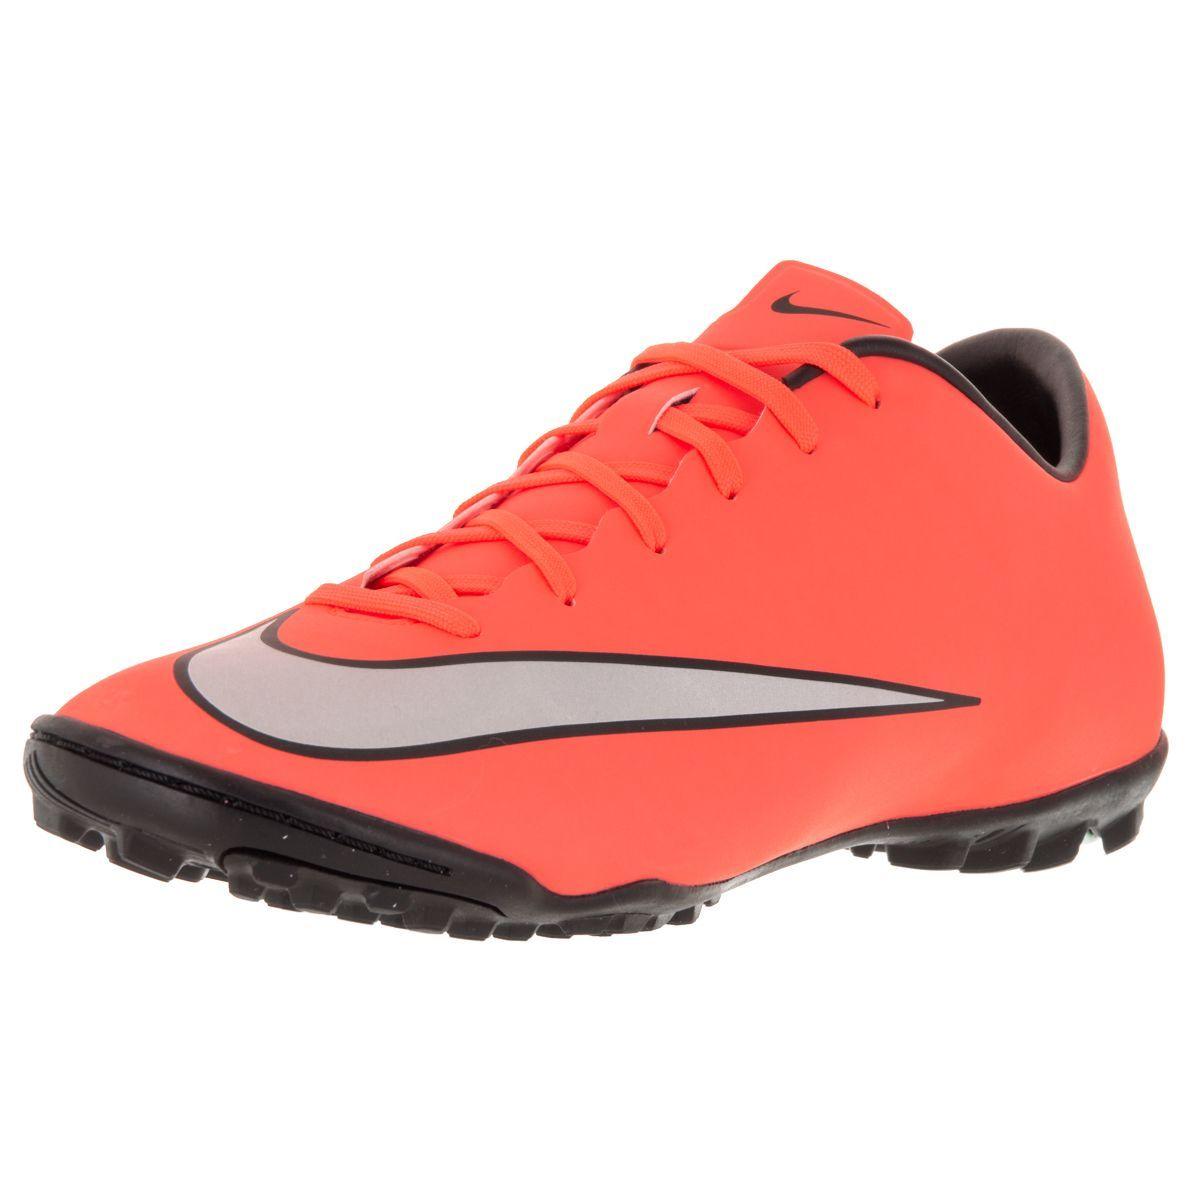 Nike Men's Mercurial Victory V Tf Brightt Magenta/ Silver/ Trq Turf Soccer Shoe